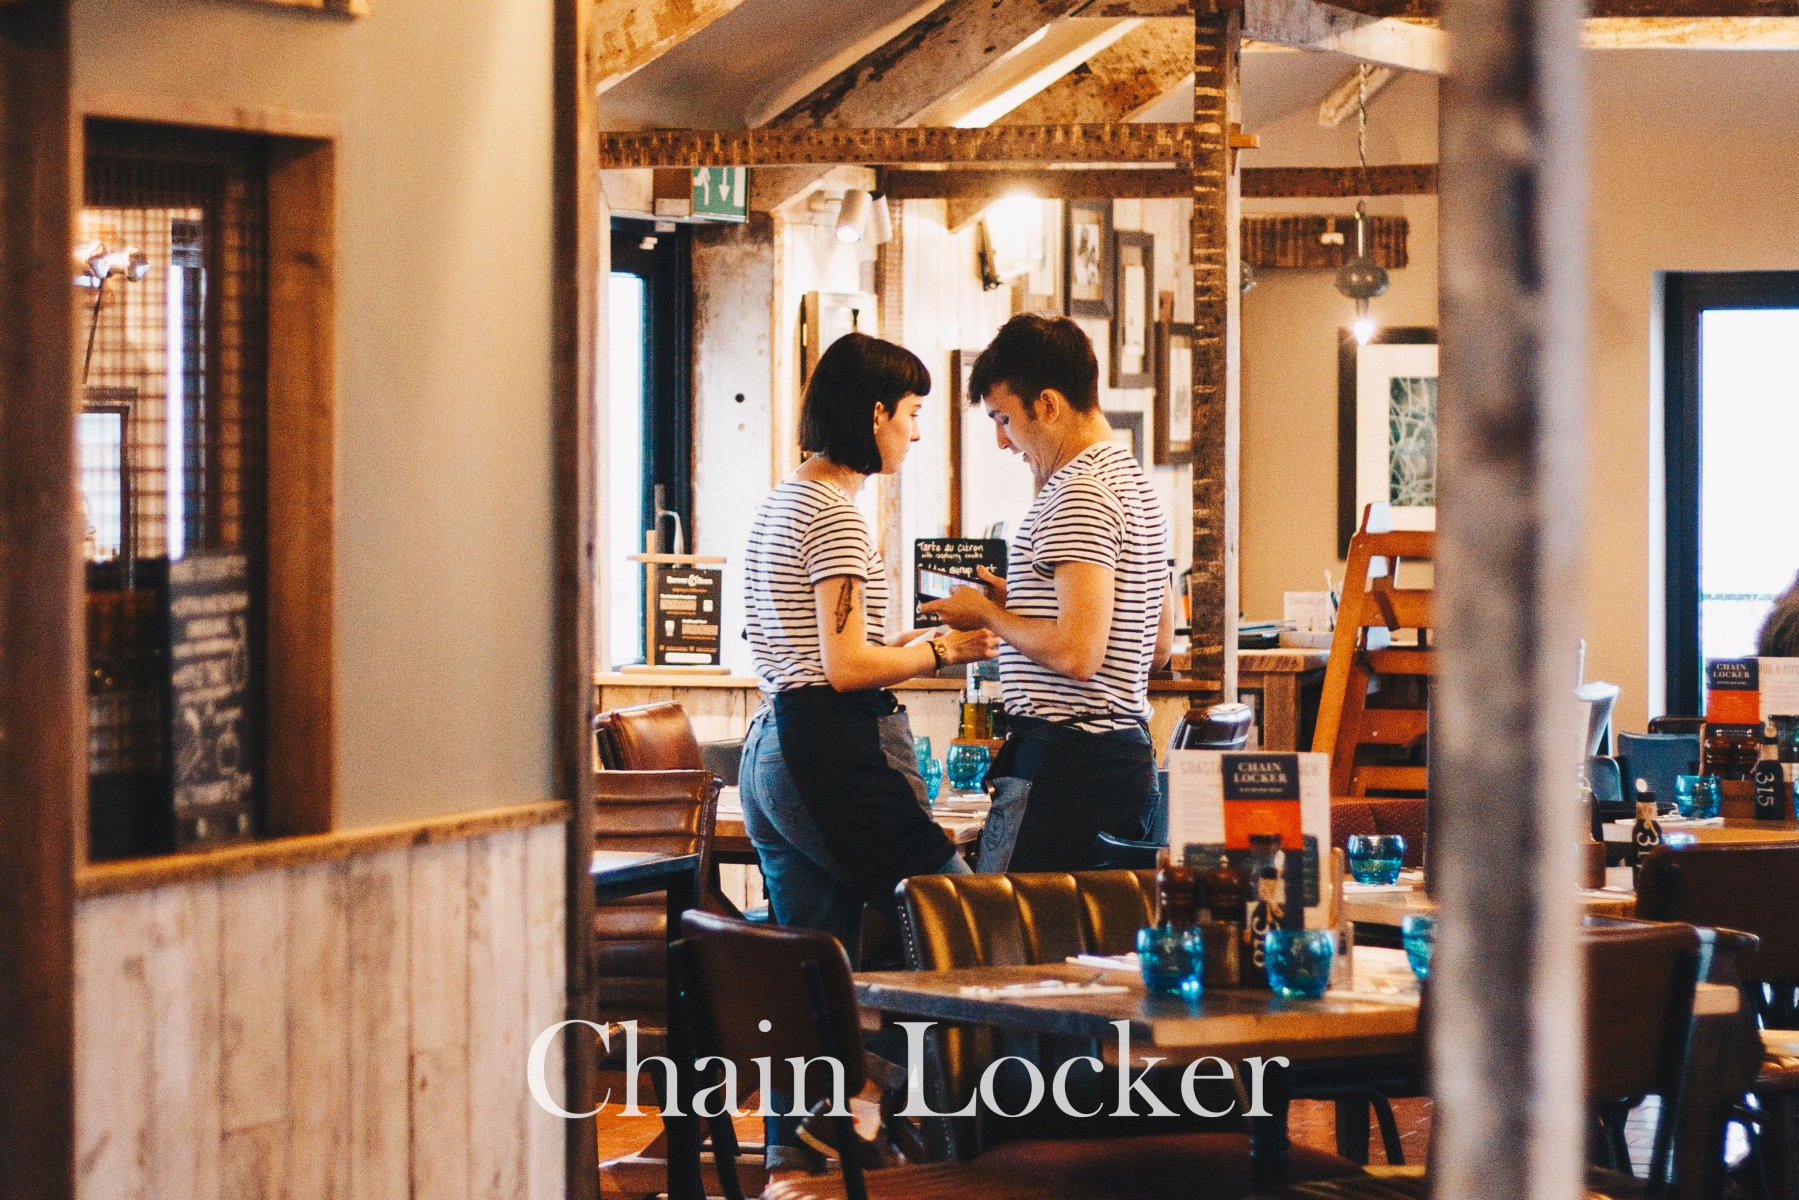 17. Chain Locker